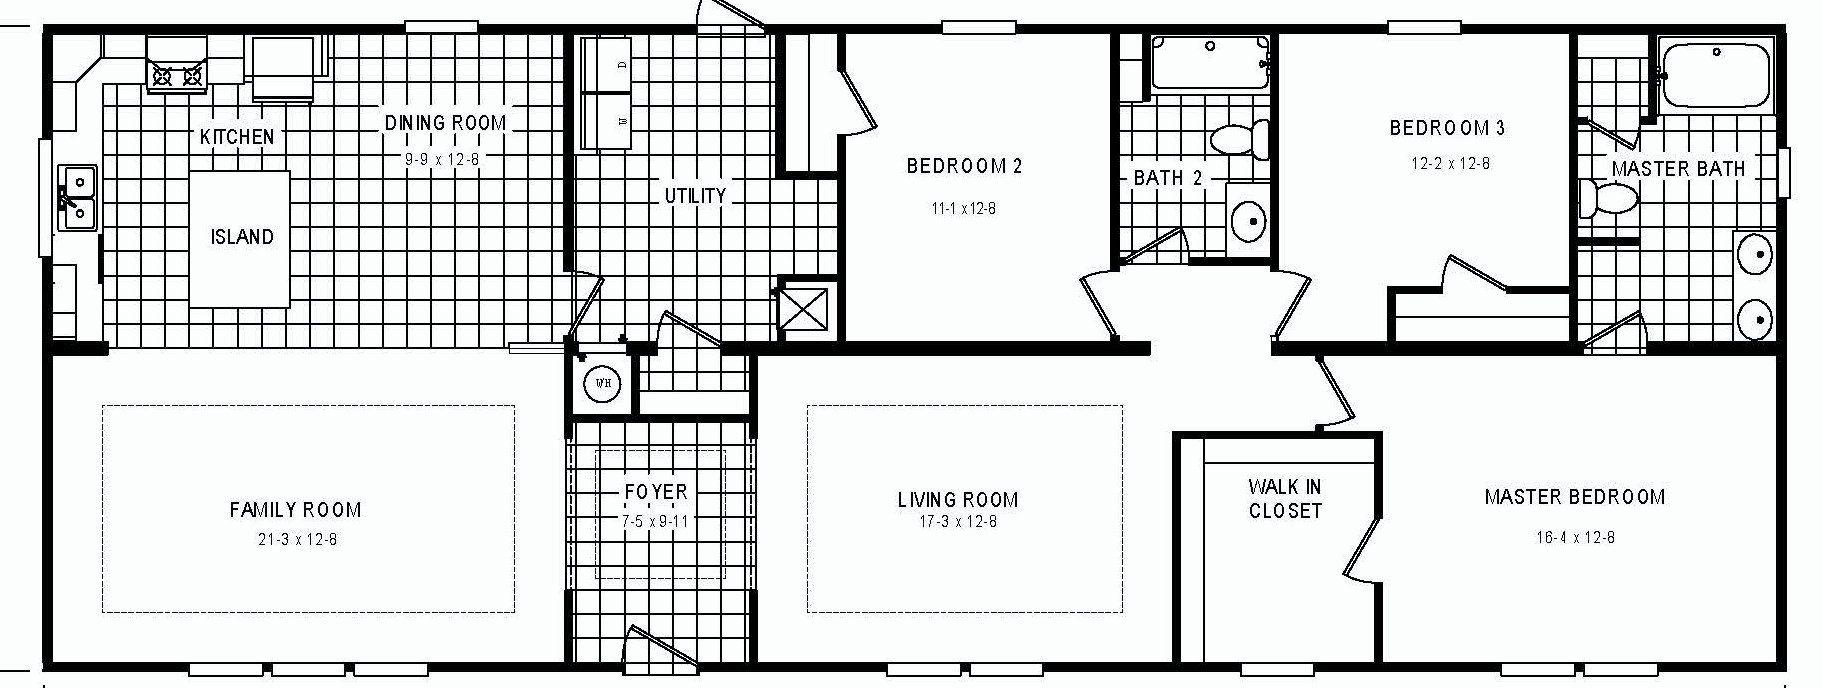 Charleston wv premier manufactured and modular home dealer